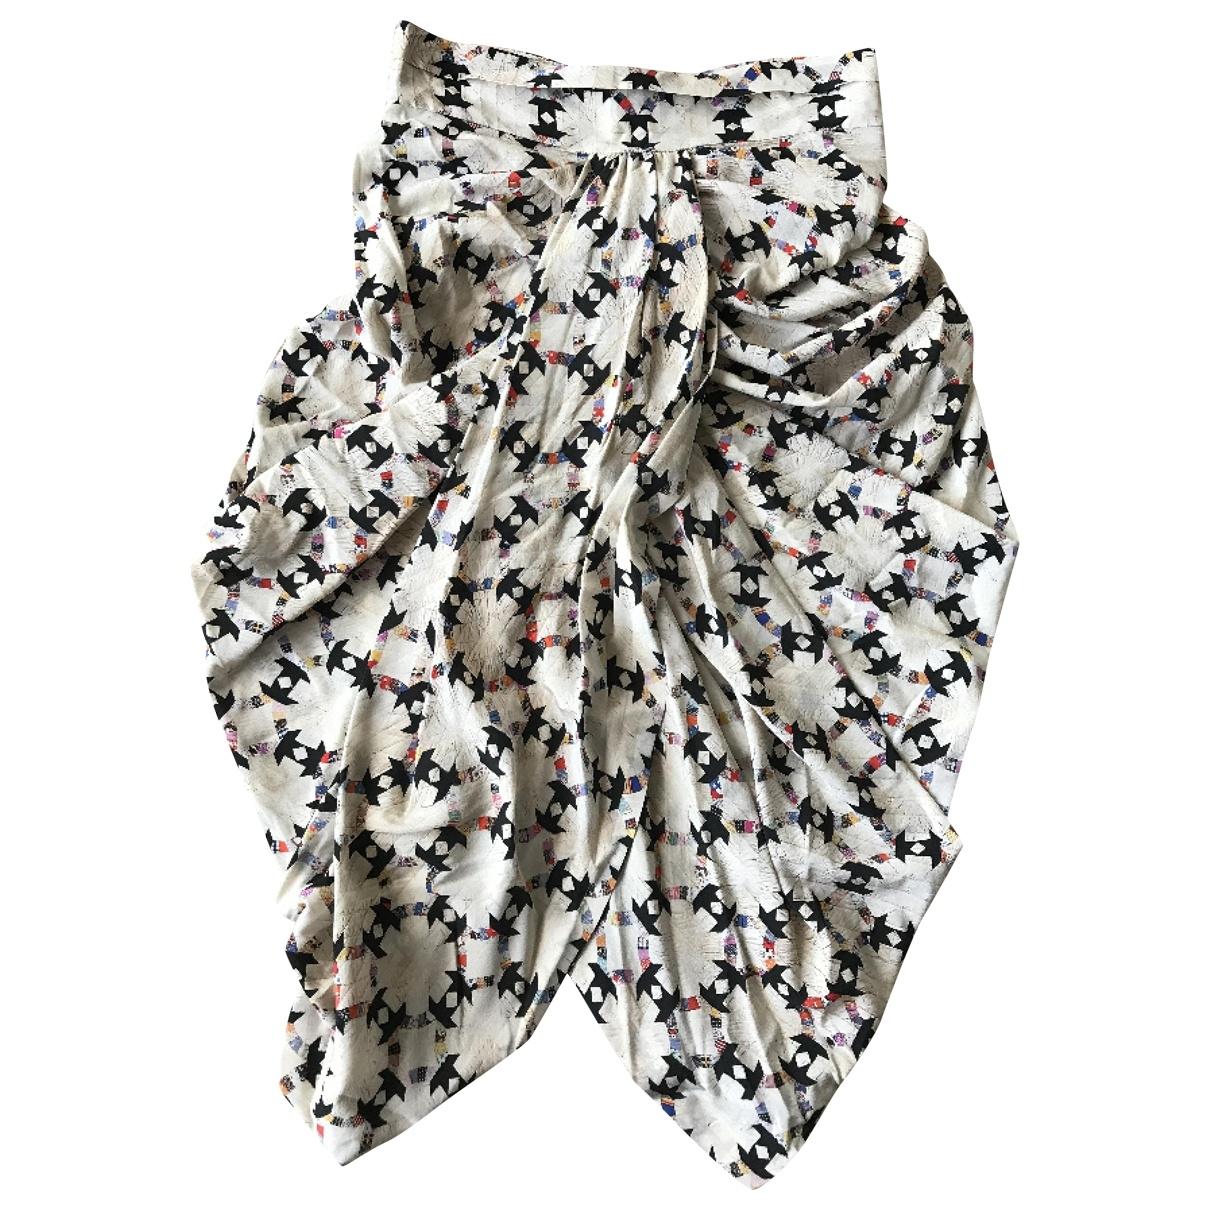 Isabel Marant \N Beige Silk skirt for Women 38 IT